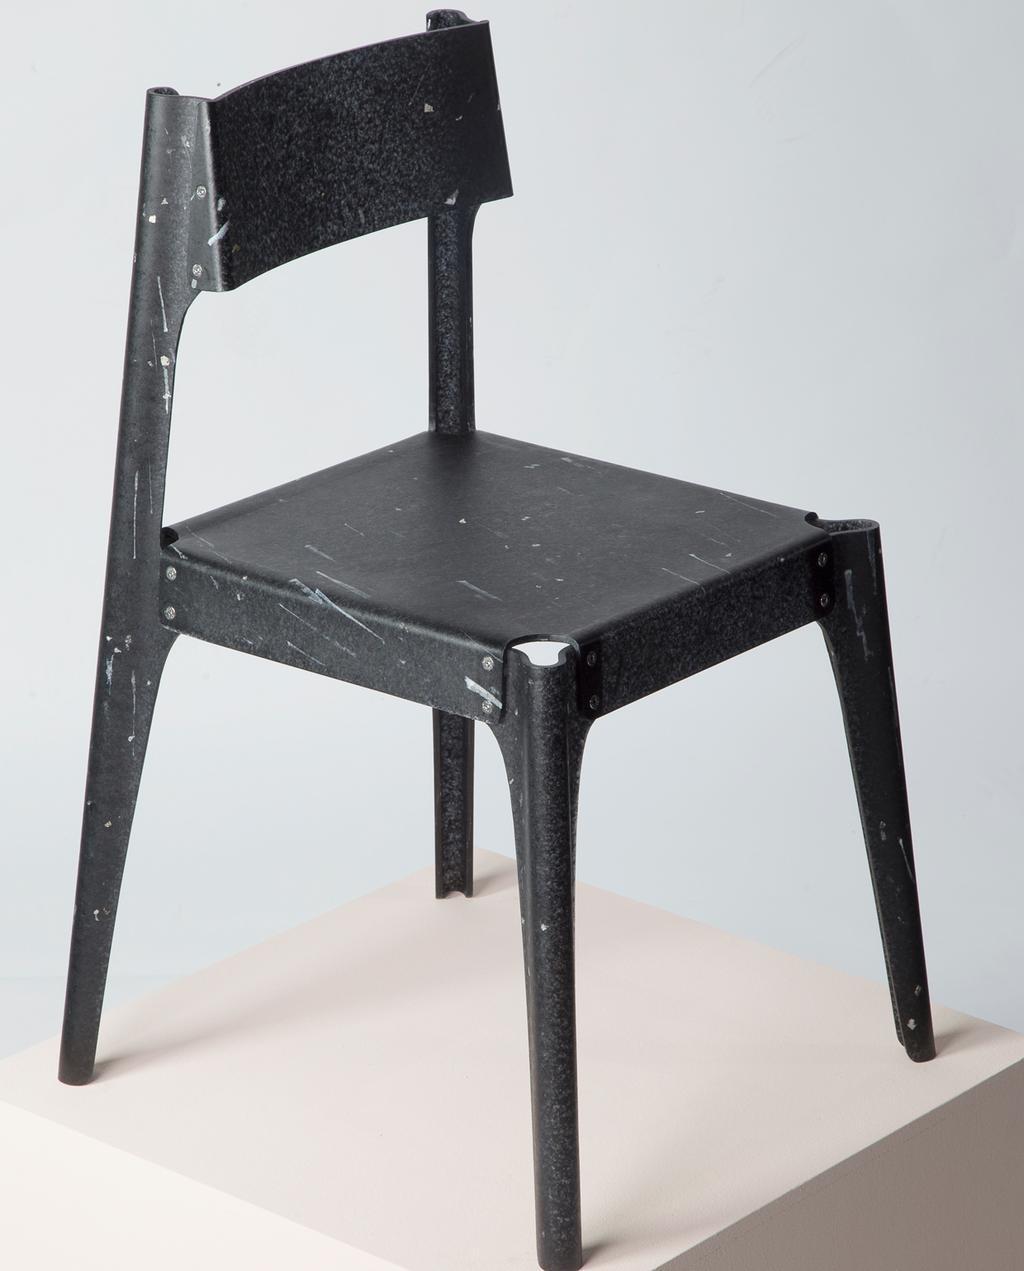 vtwonen | StudentDesign Alexander Schul zwart kunststof